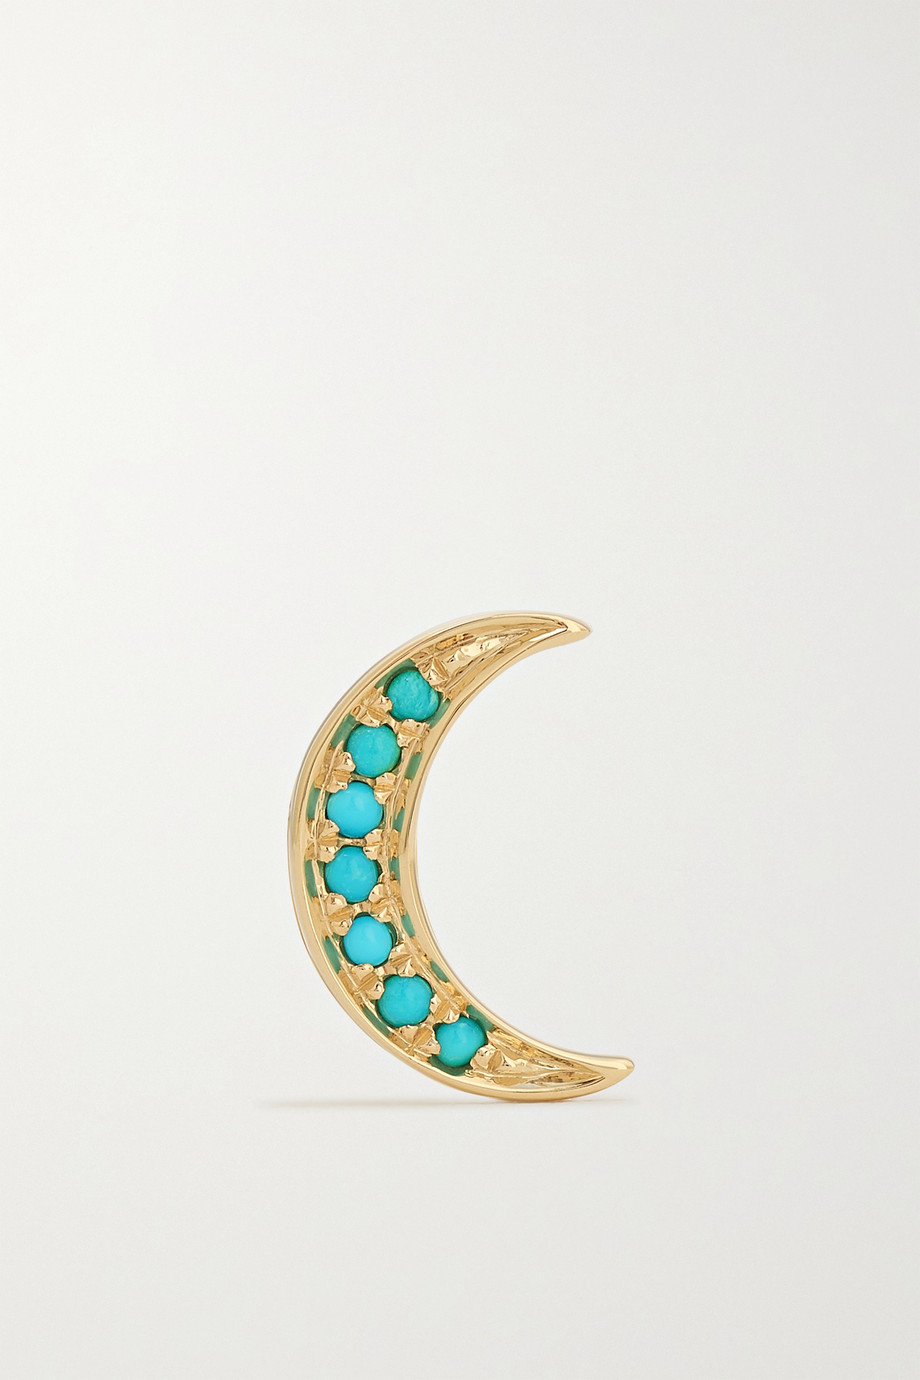 Andrea Fohrman Mini Crescent Ohrring aus 14 Karat Gold mit Türkisen